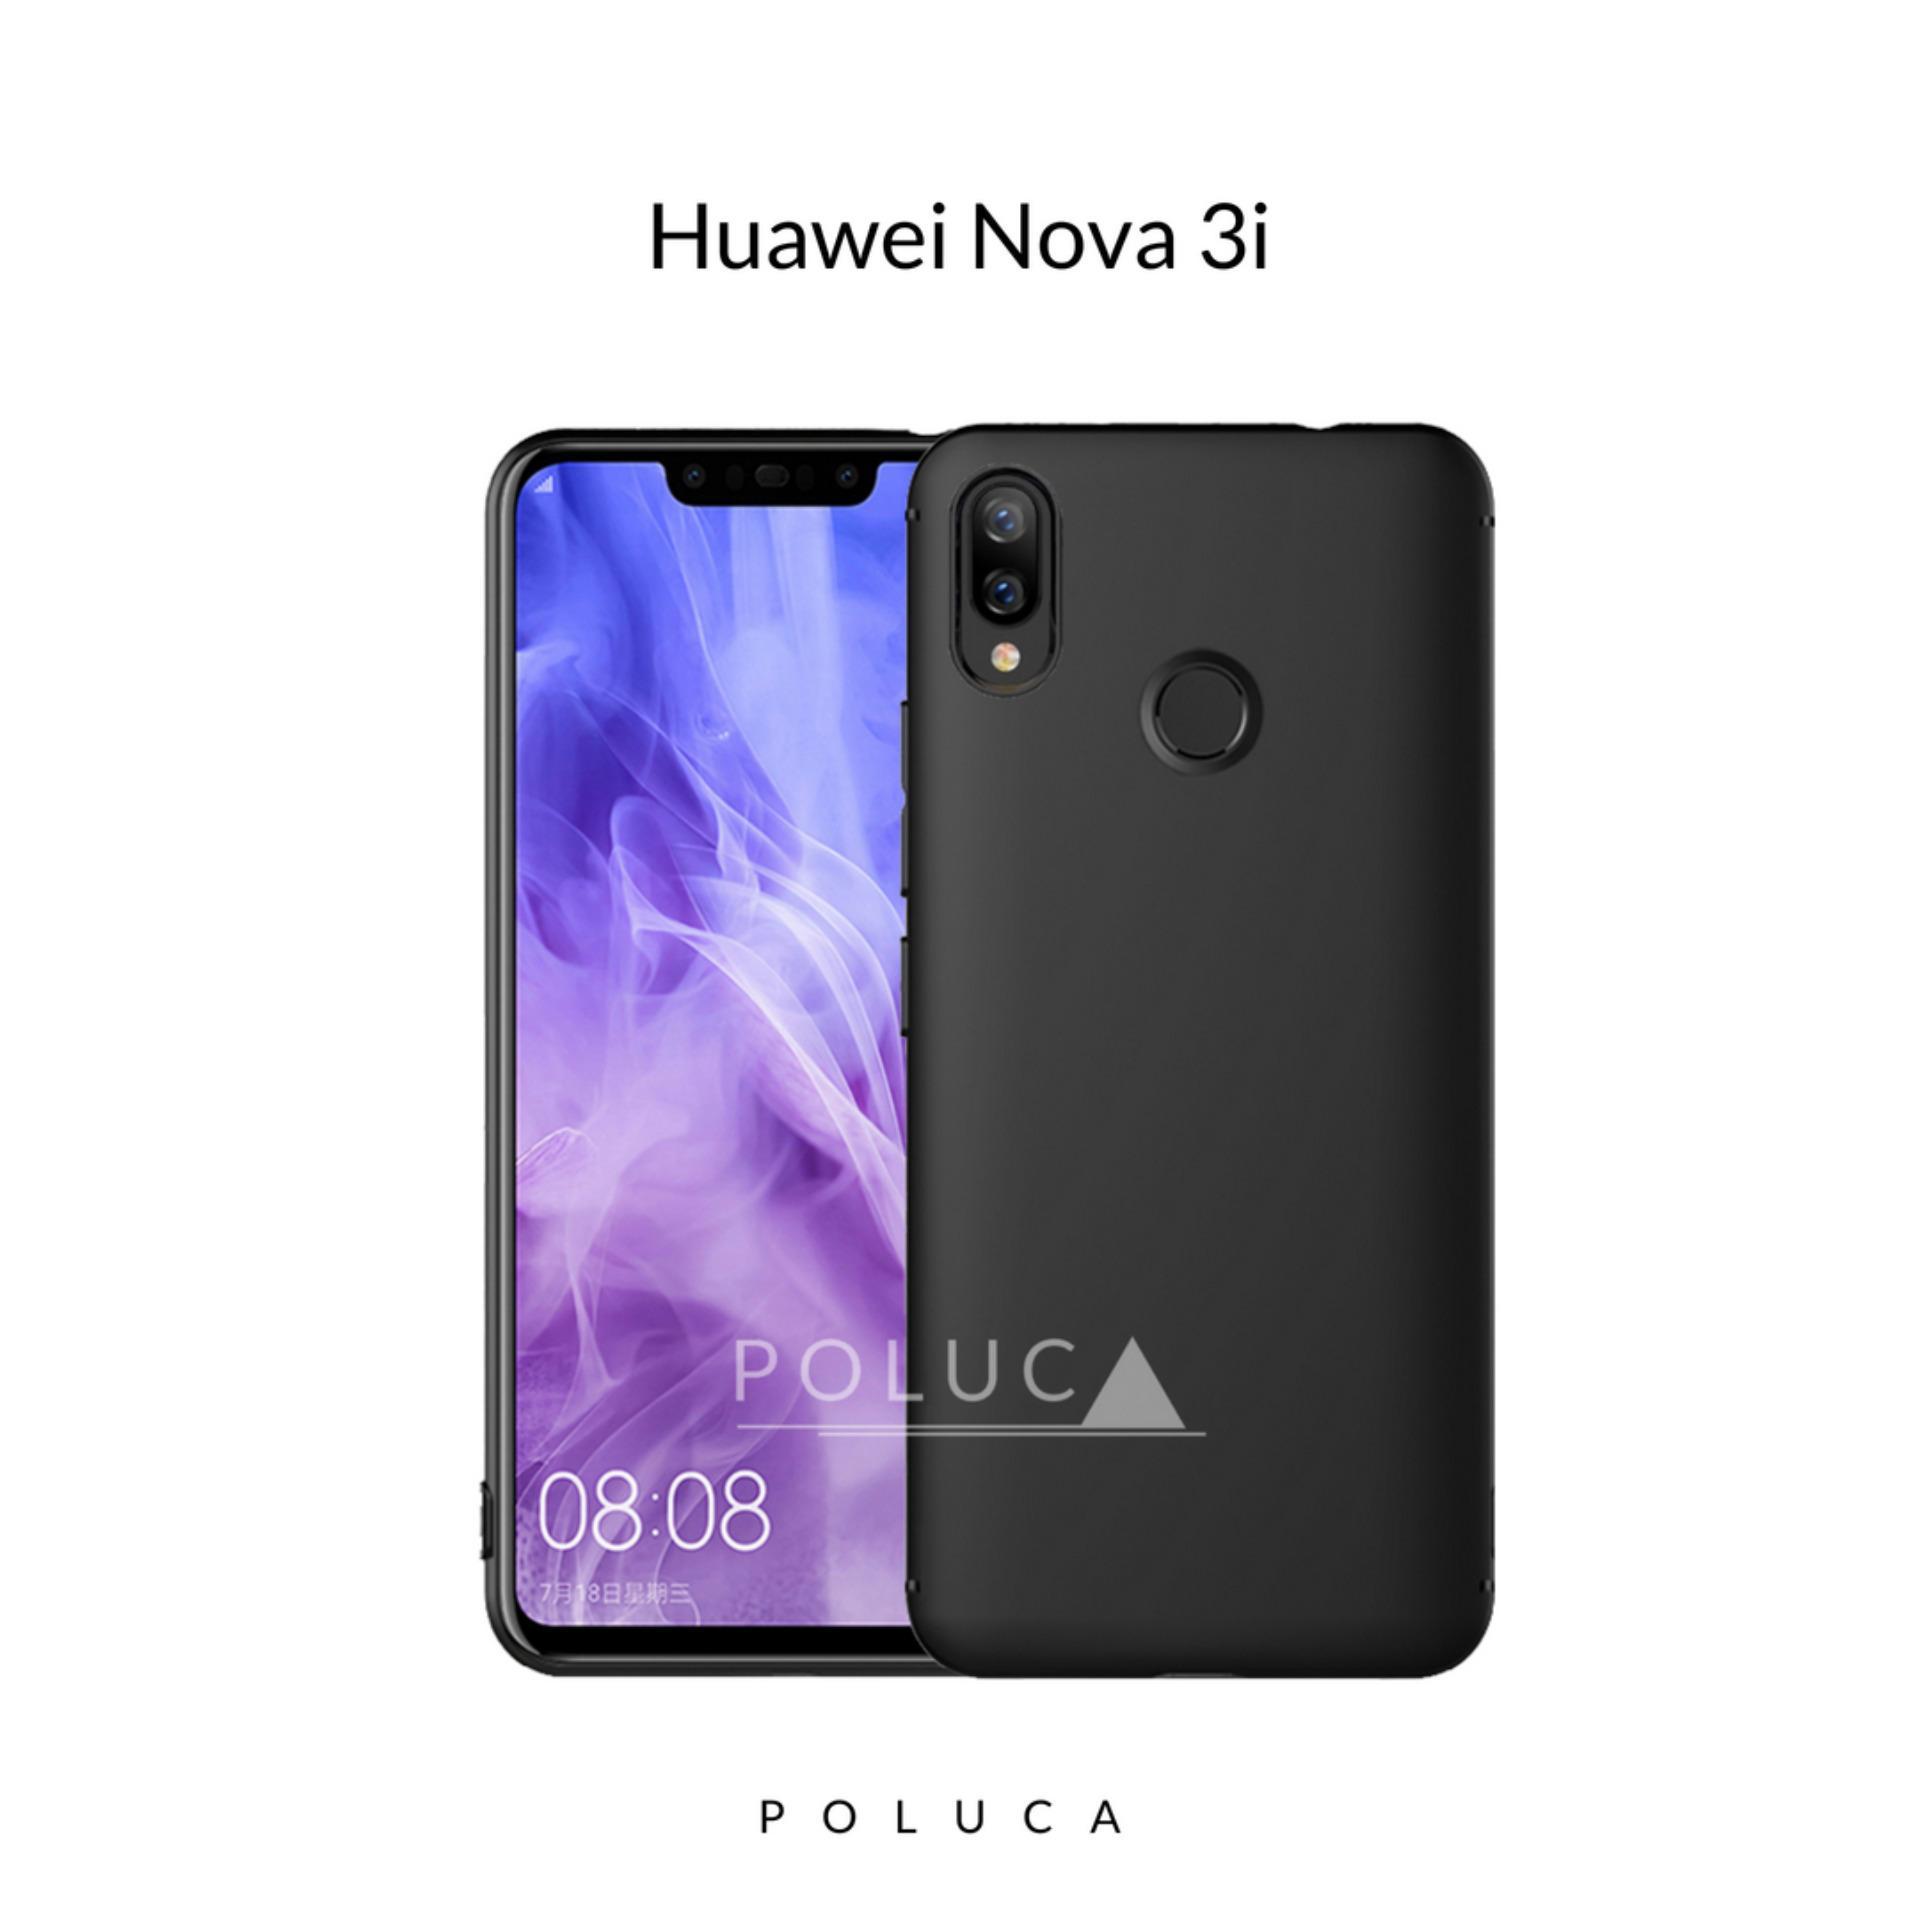 Poluca Case Huawei Nova 3i Slim Black Matte Babyskin Softcase Ultra Thin Jelly Silikon - Black